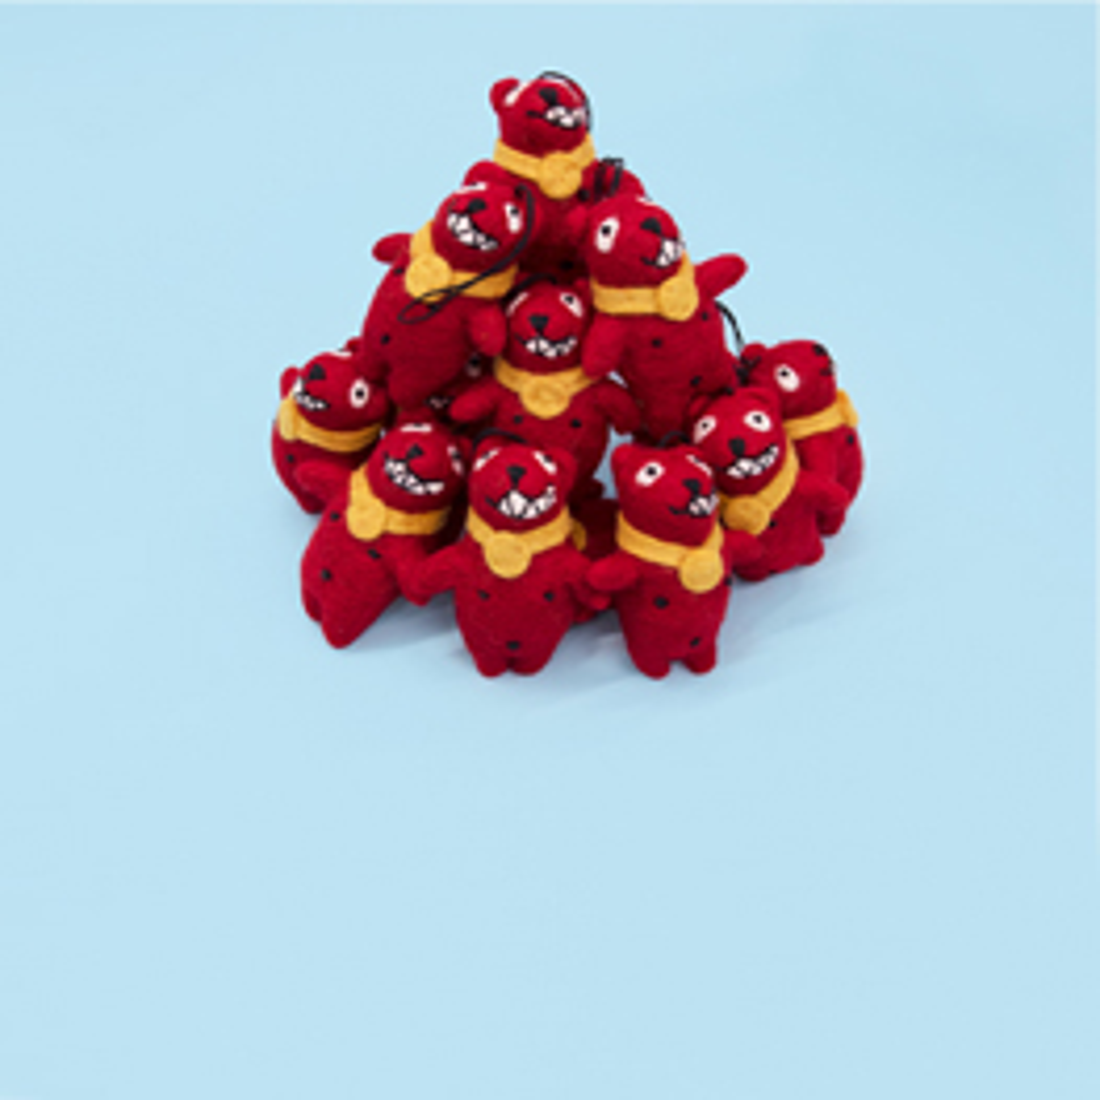 Royal Academy Christmas Decorations